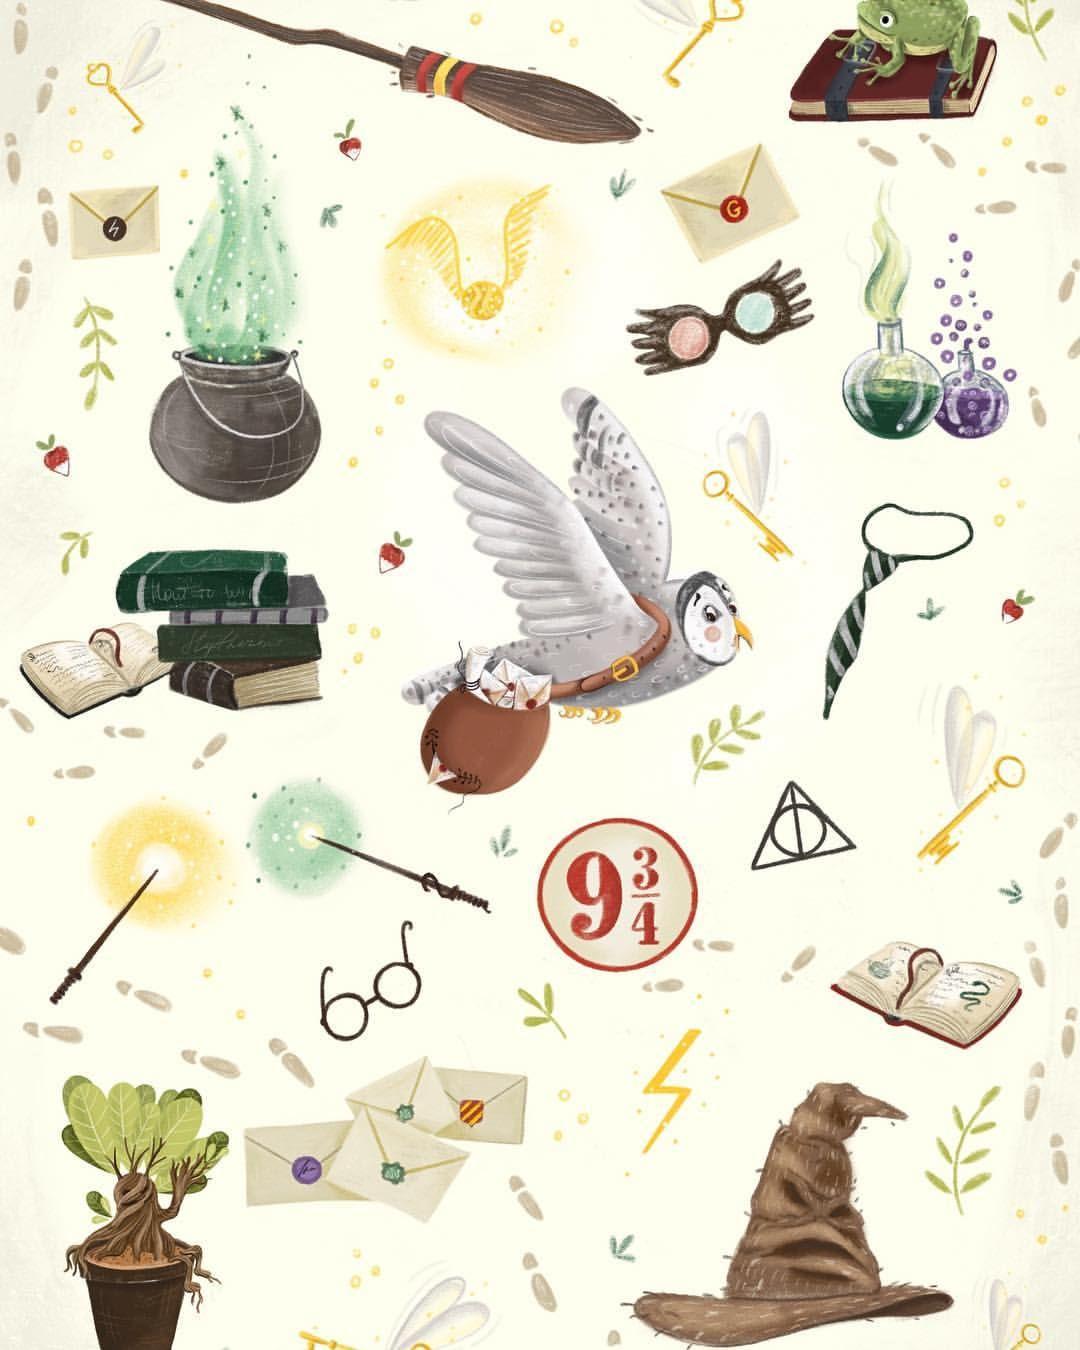 Giveaway Harry Potter Stickers Coming Soon скоро скоро скоро я подарю вам в Harry Potter Fondos De Pantalla Arte De Harry Potter Decoración Harry Potter